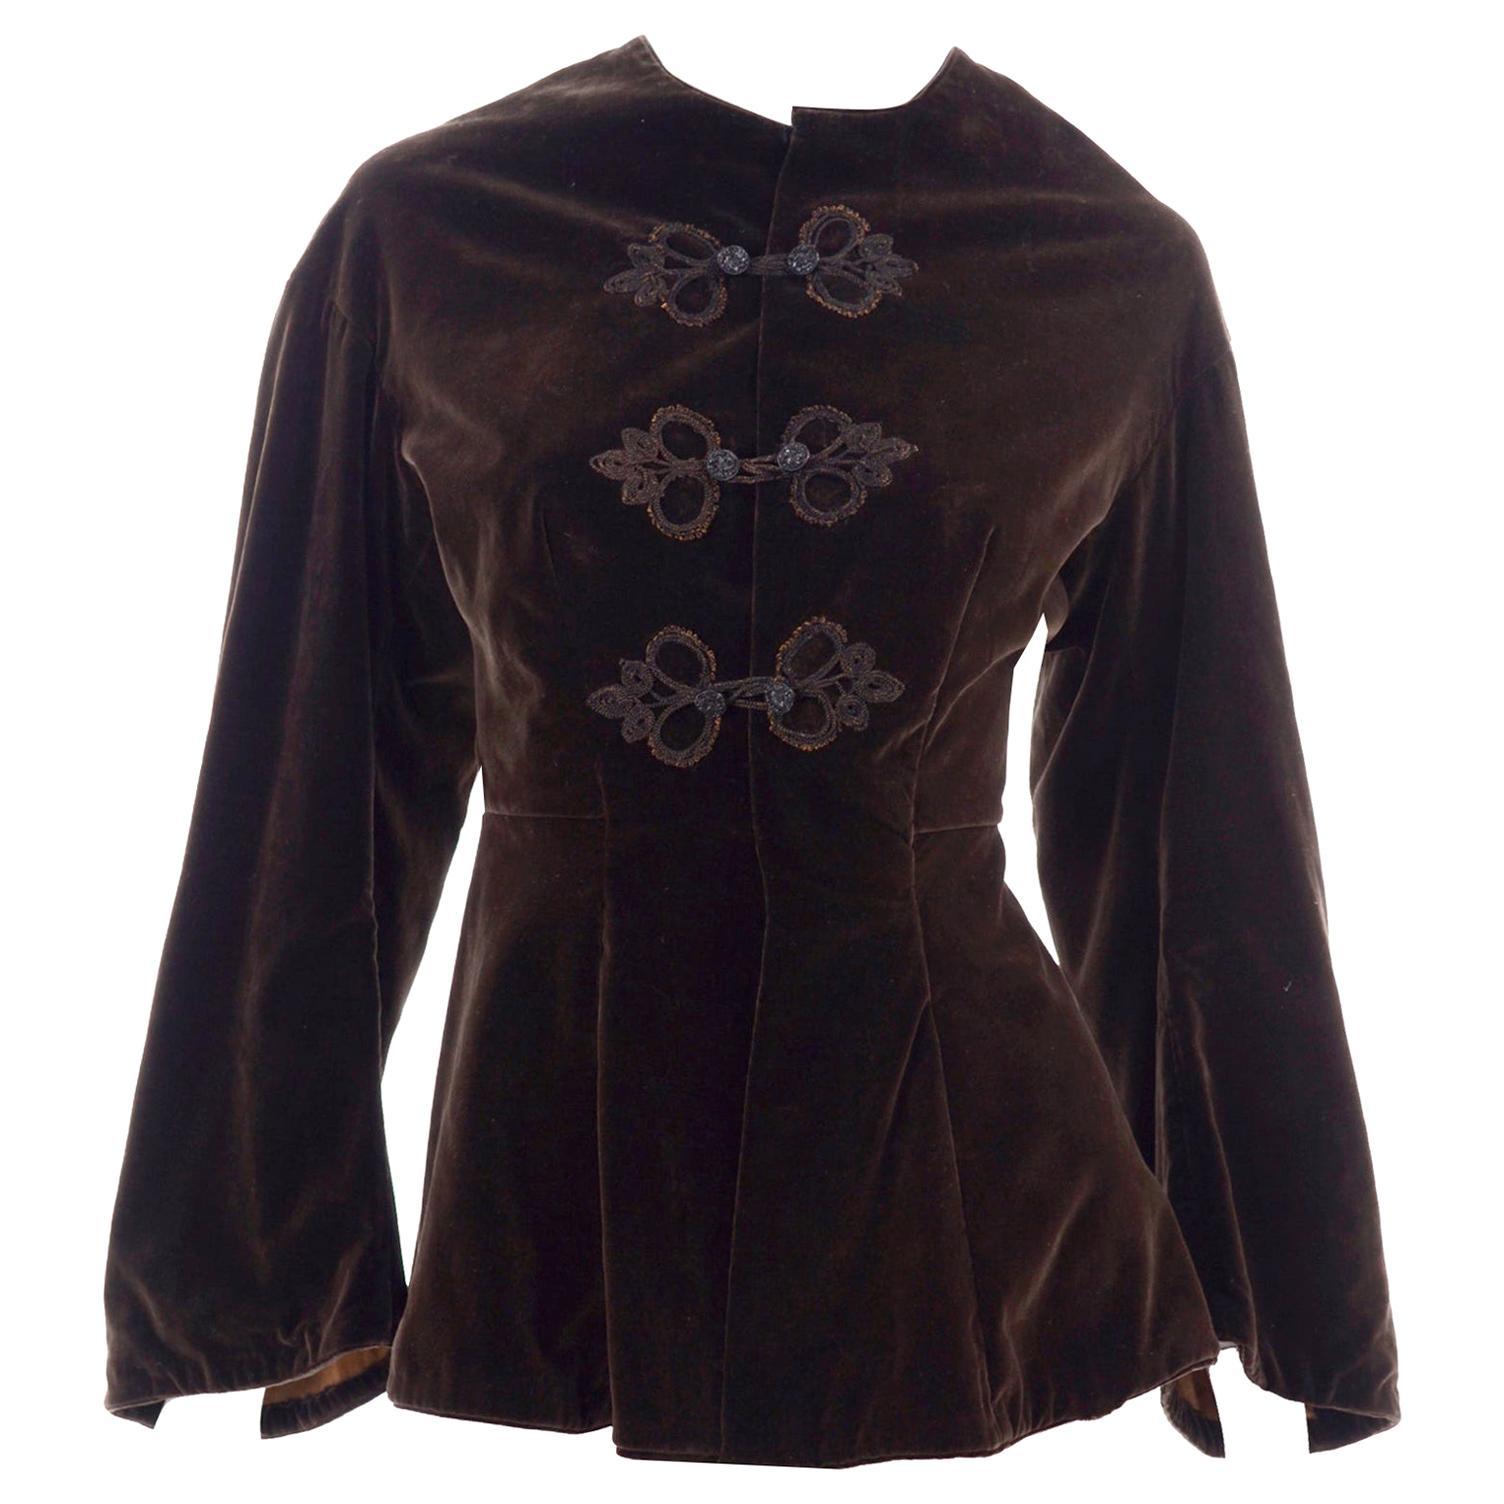 Vintage 1900s Edwardian Basque Brown Velvet Jacket with Peplum & Soutache